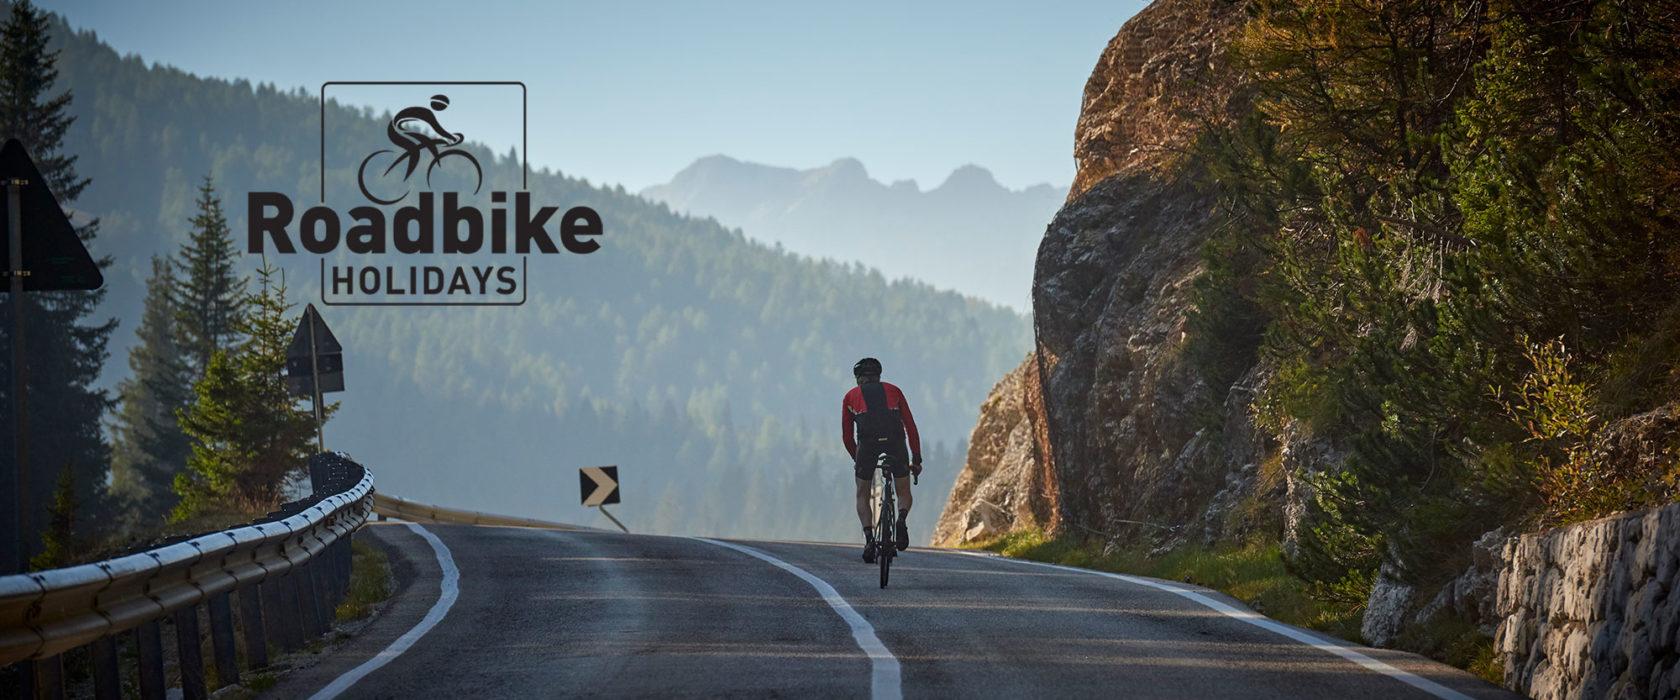 roadbike-holidays-dolomiten-urlaub